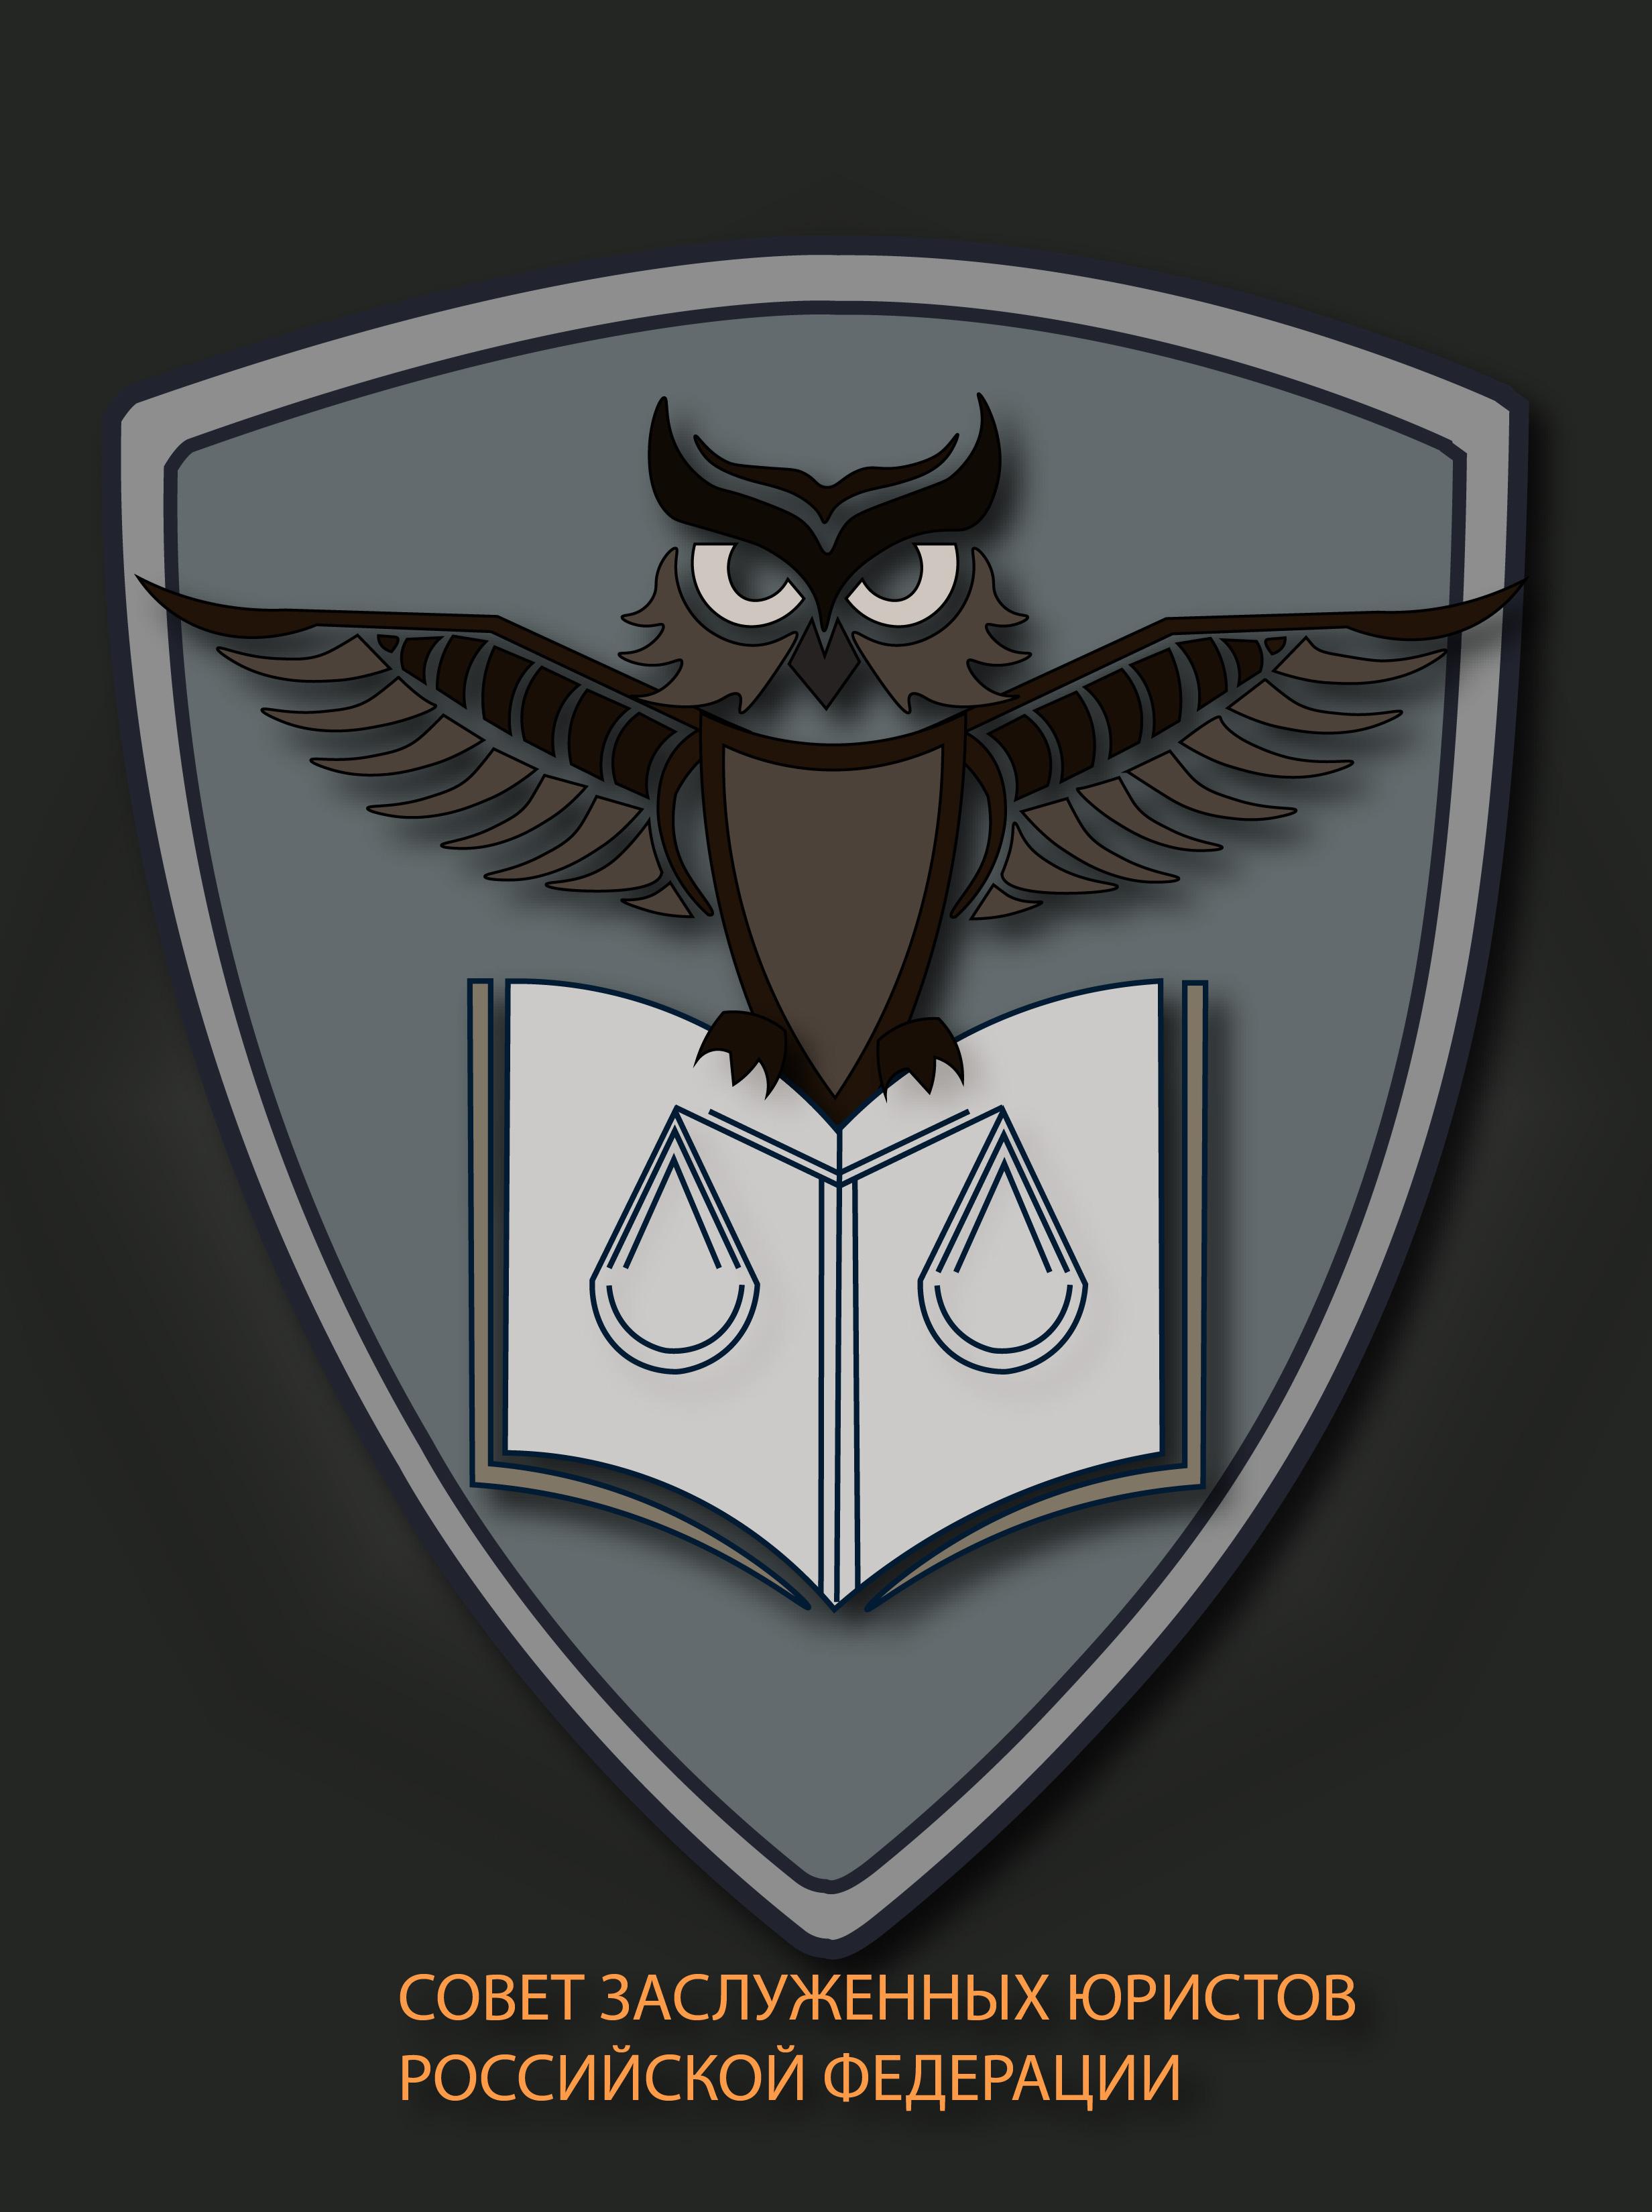 Разработка логотипа Совета (Клуба) заслуженных юристов Российской Федерации фото f_5845e498a15a54c8.jpg